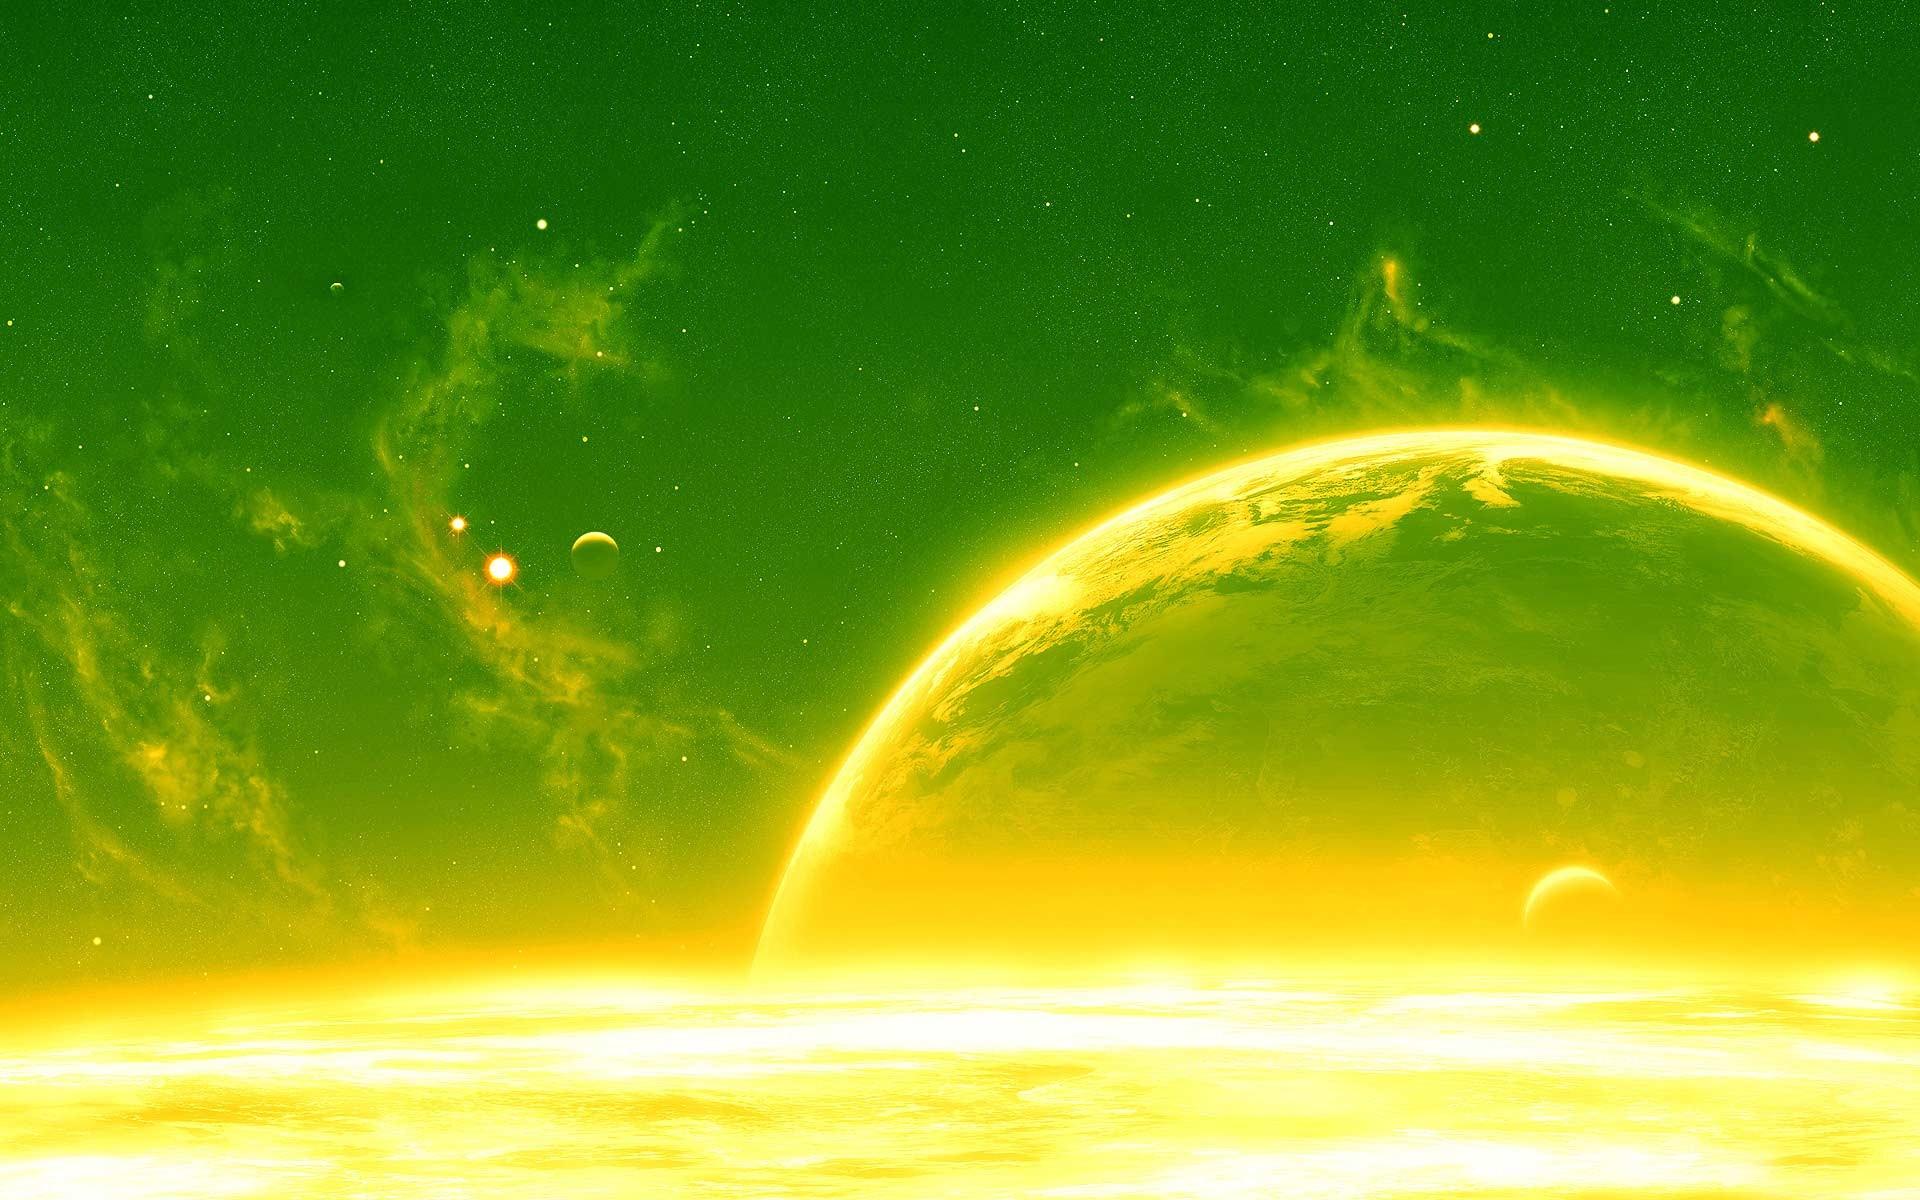 Space Amazing Pics Site 1920x1200 HD Wallpaper